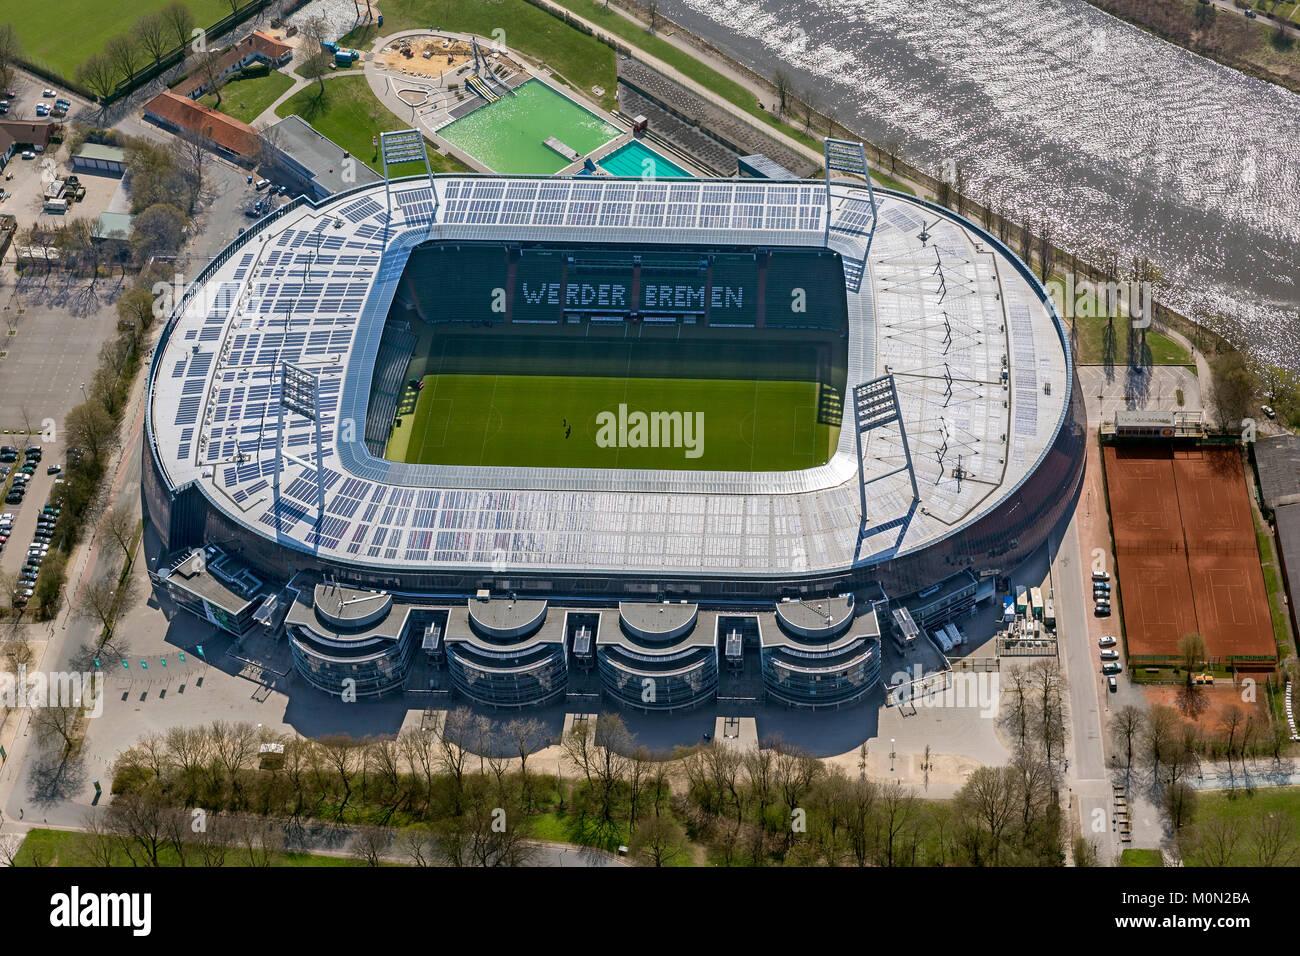 Weserstadion of Werder Bremen GmbH & Co. KGaA, Bundesliga football club, solar roof, Stadium football stadium - Stock Image